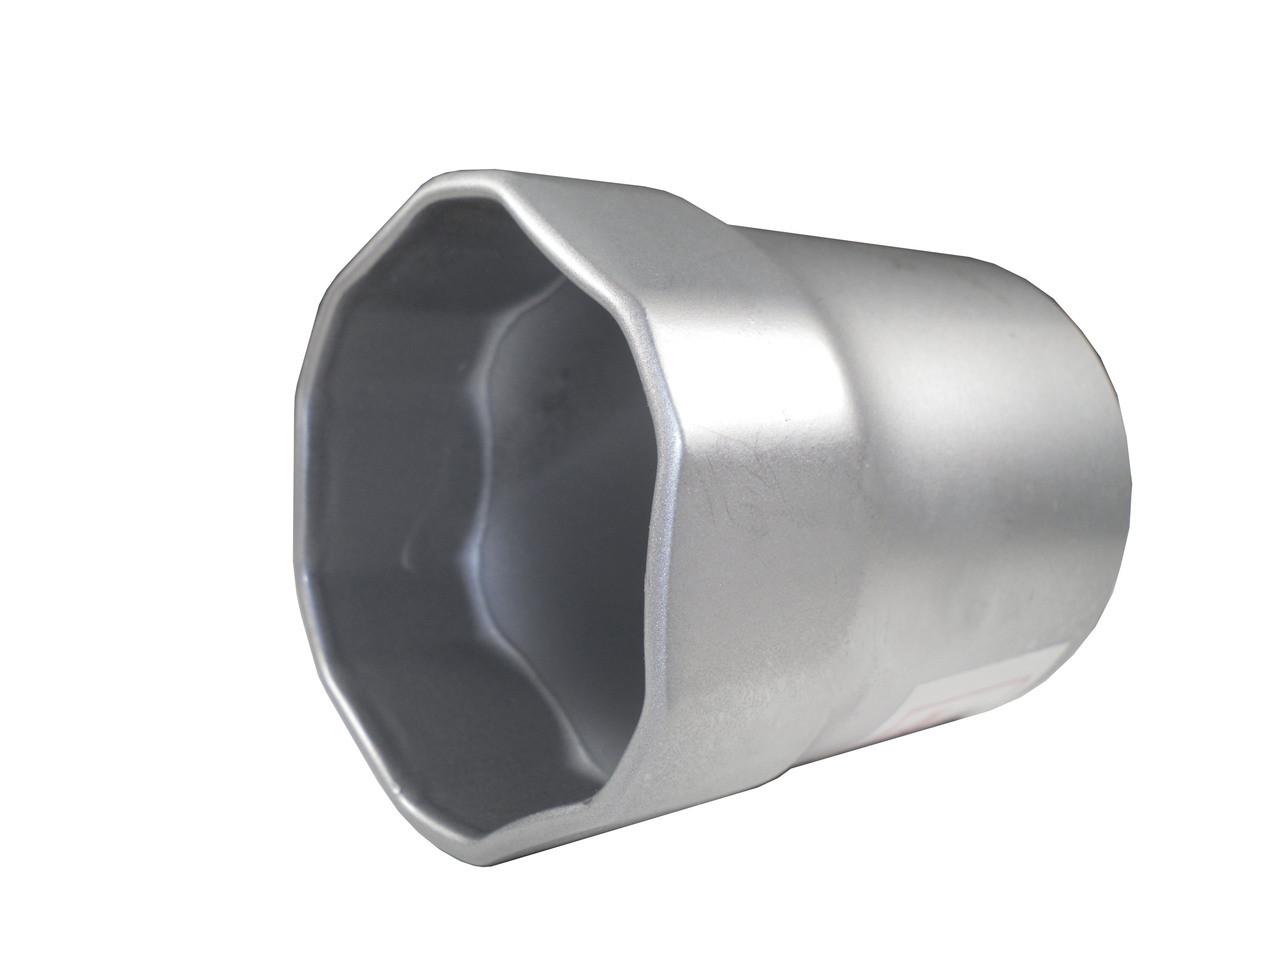 "QT1009i 2-9/16"" Rounded Hex Rear Spindle Nut Socket 1/2"